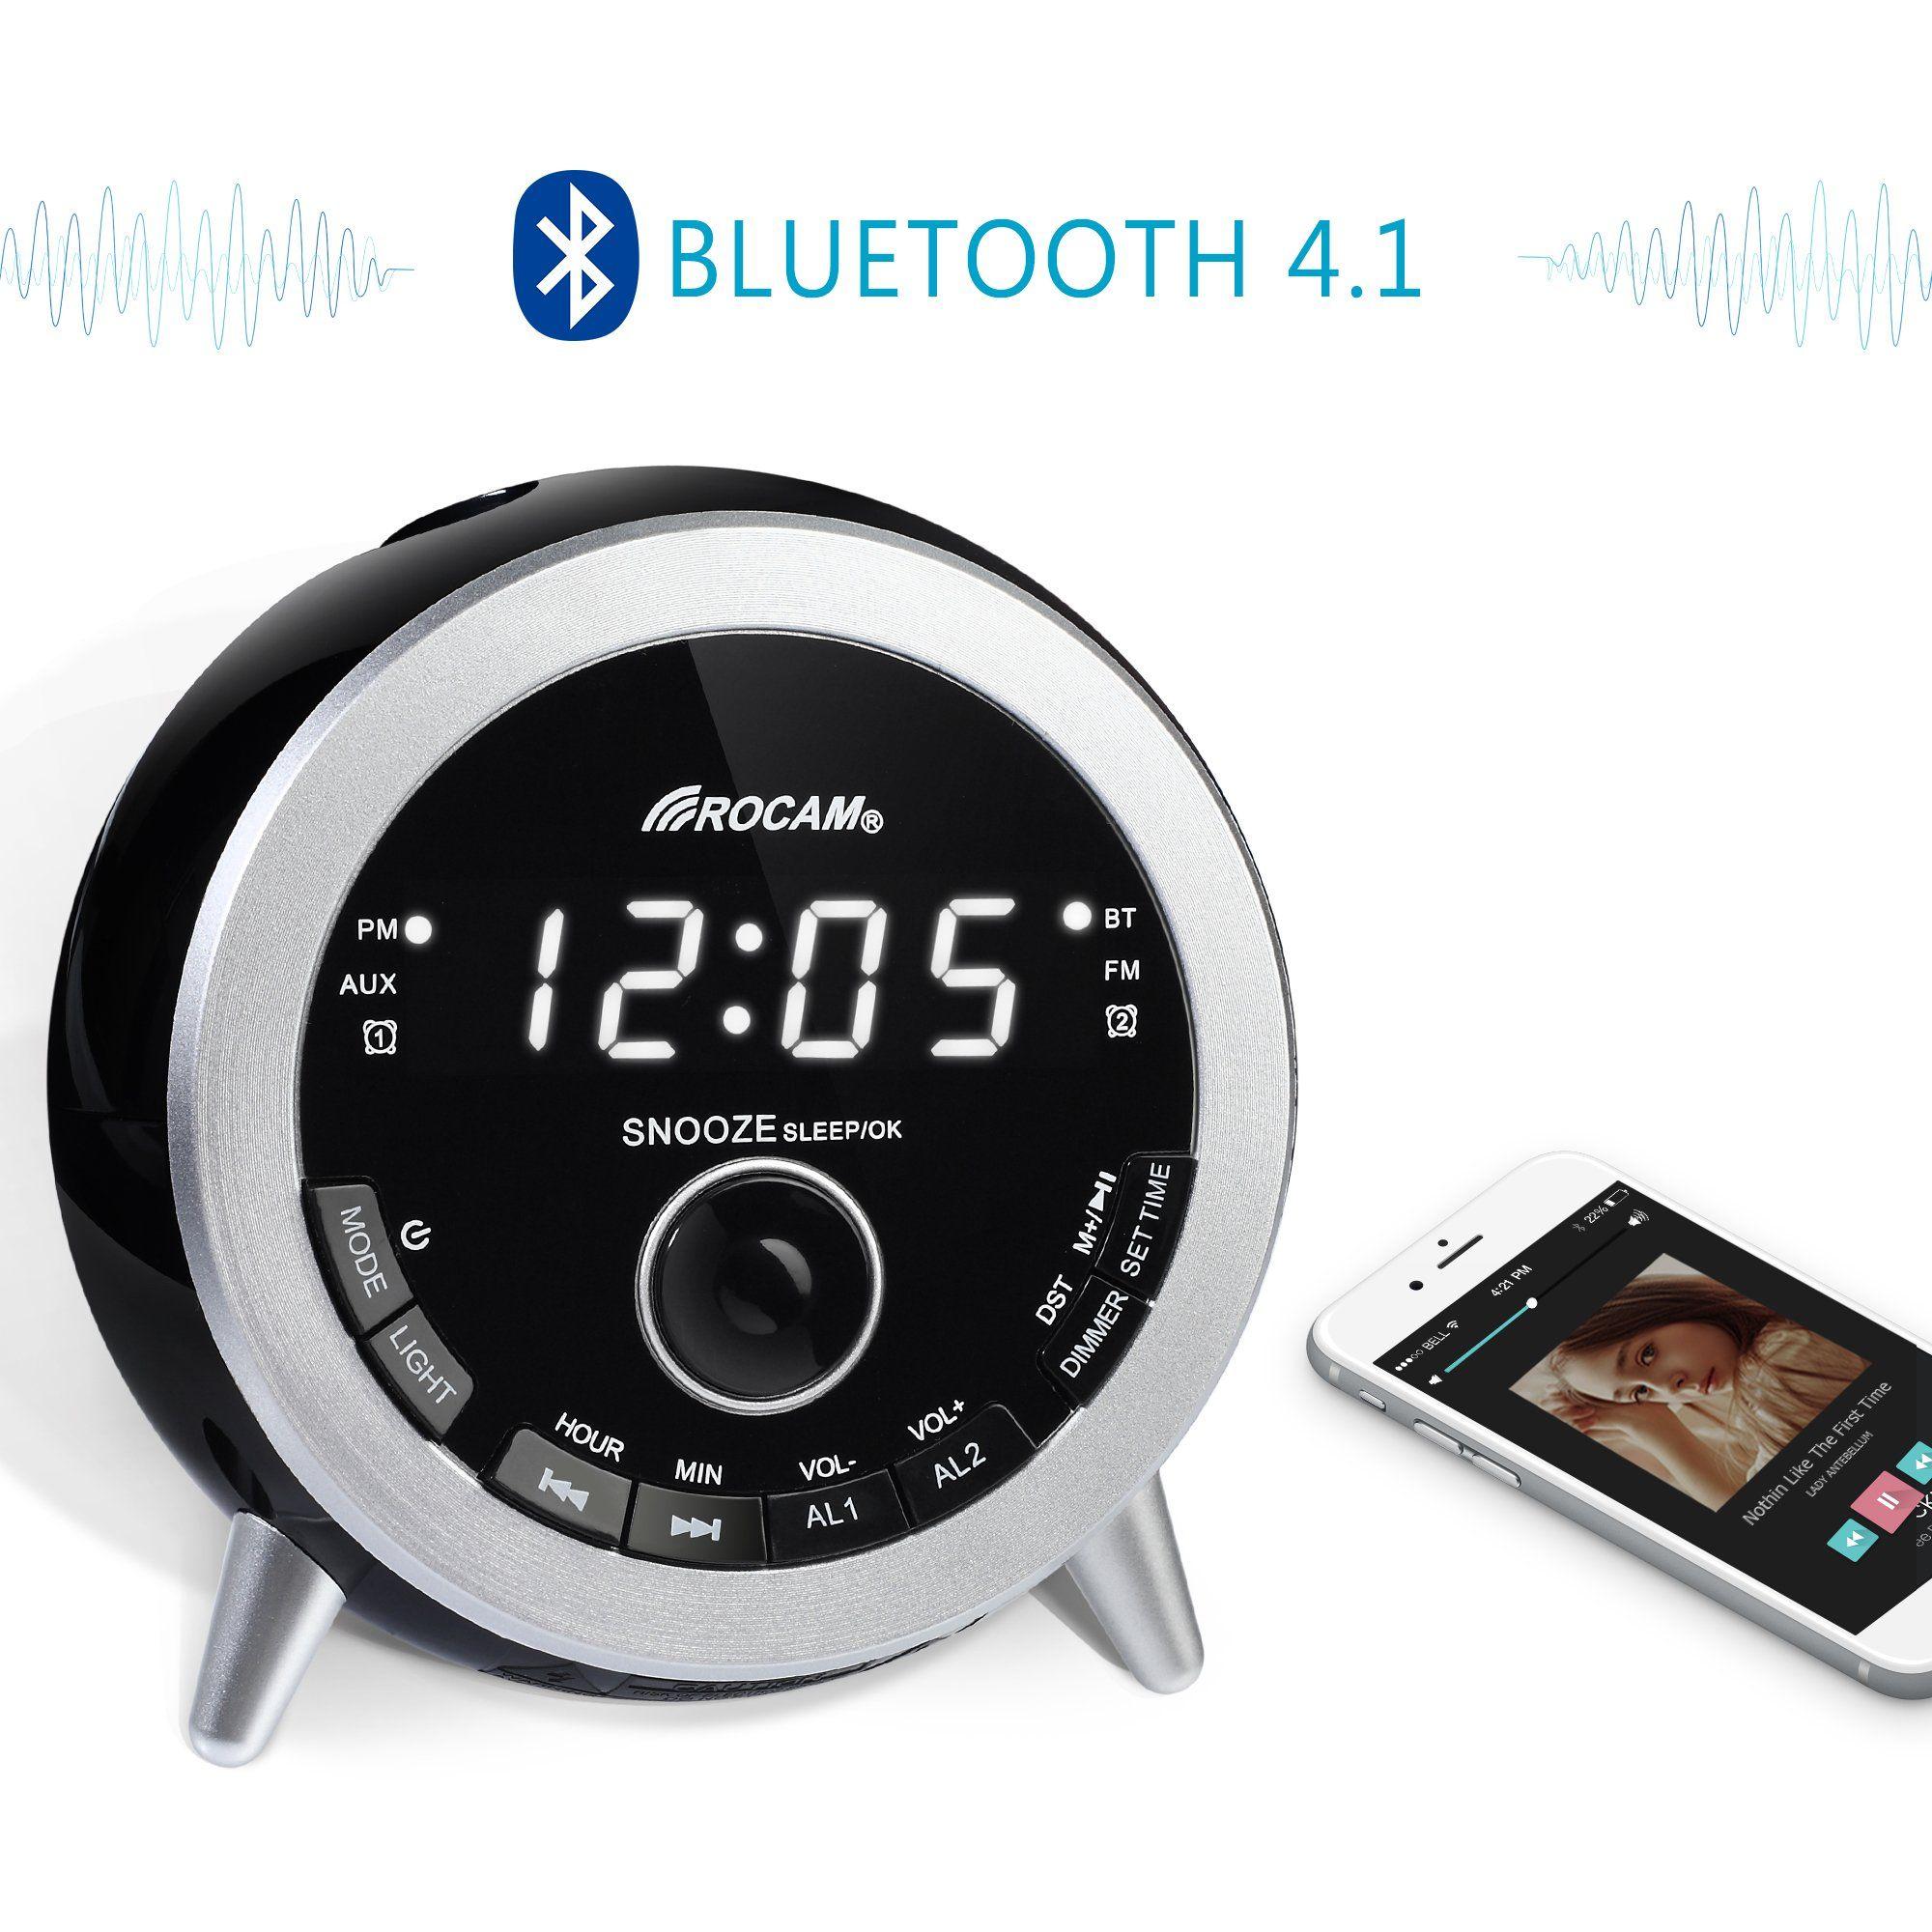 83ac2f8ee0c ROCAM Bluetooth Digital Alarm Clock Radio with FM Radio Dual Alarm Snooze Night  Light LED Display